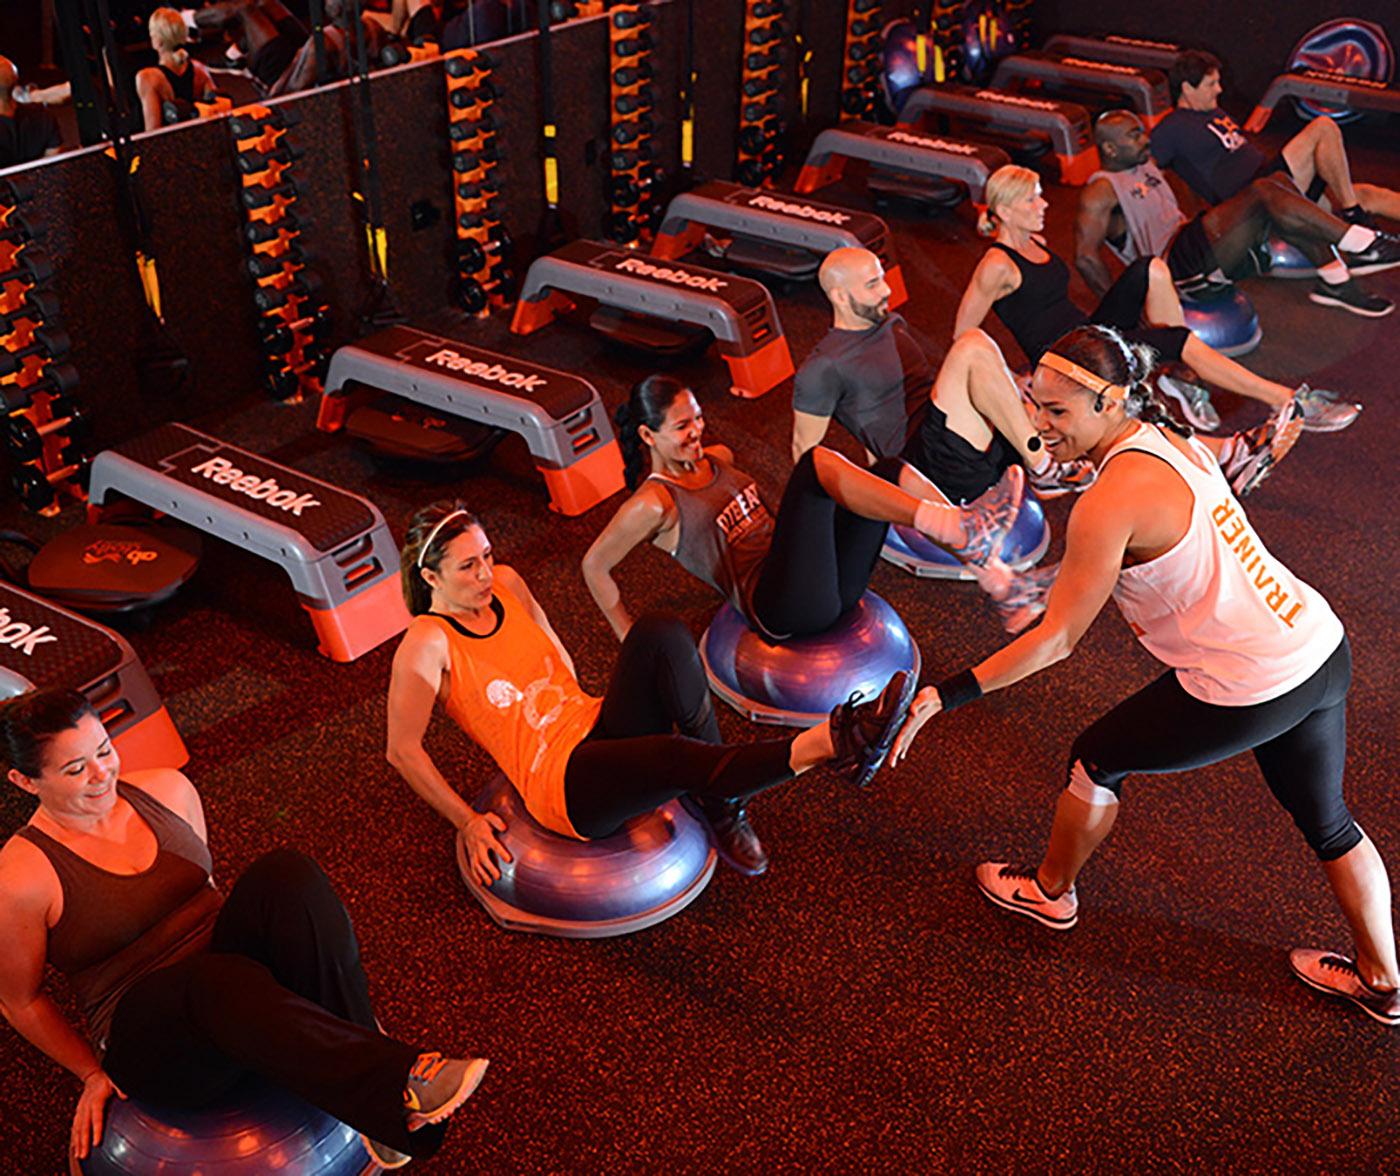 sweatworking takes over orangetheory fitness west loop